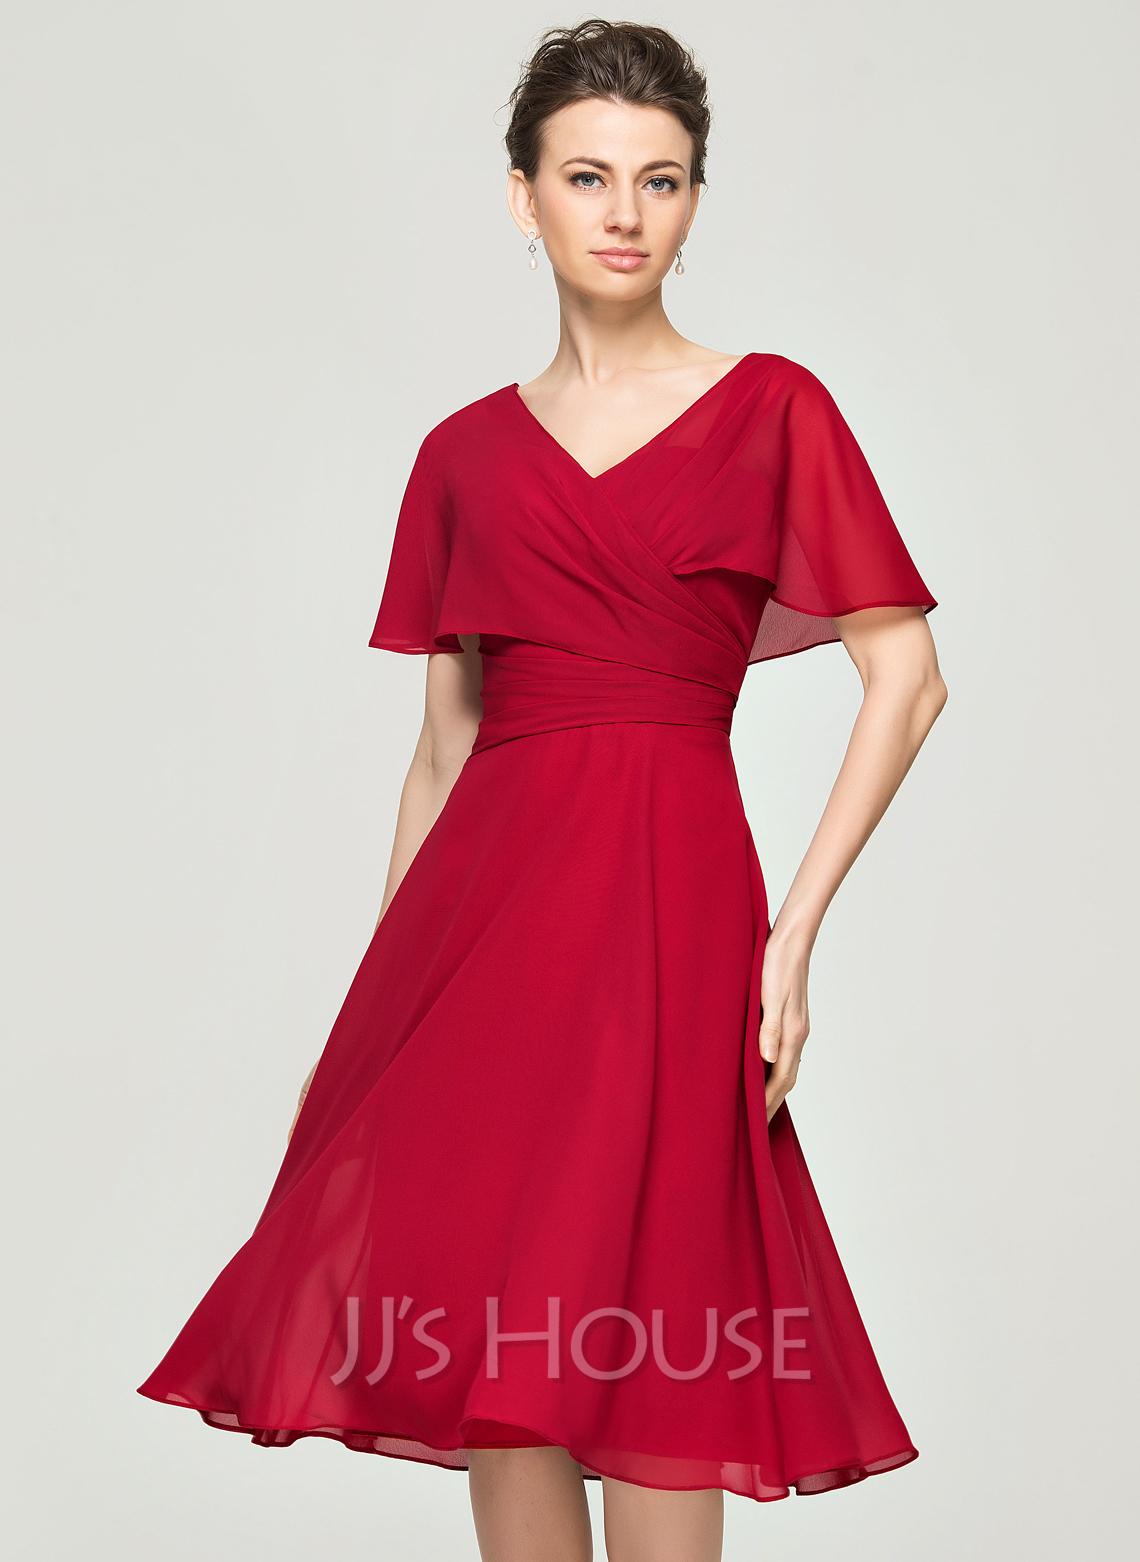 A-Line V-neck Knee-Length Chiffon Cocktail Dress With Ruffle